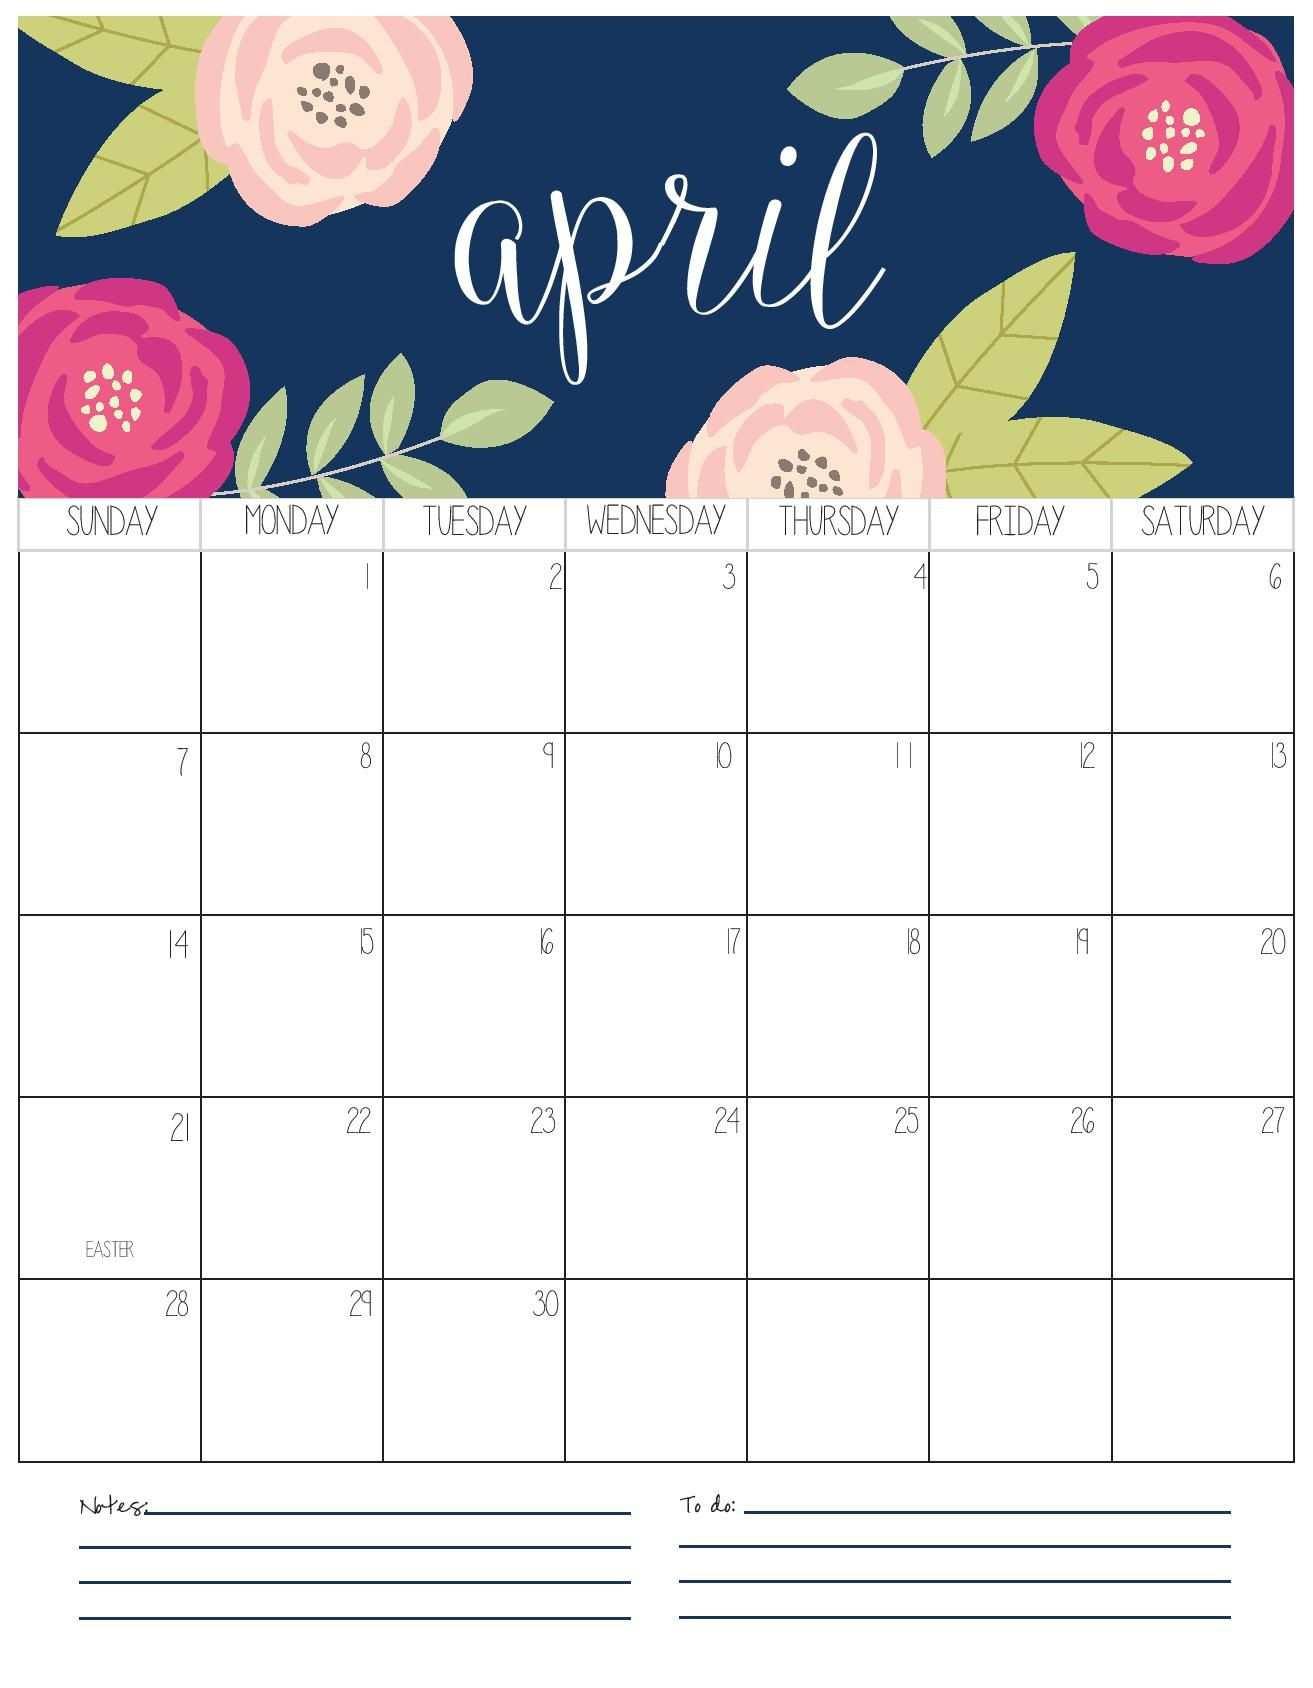 Kalender 2019 Zum Ausdrucken Fur Kinder Undangan Pernikahan